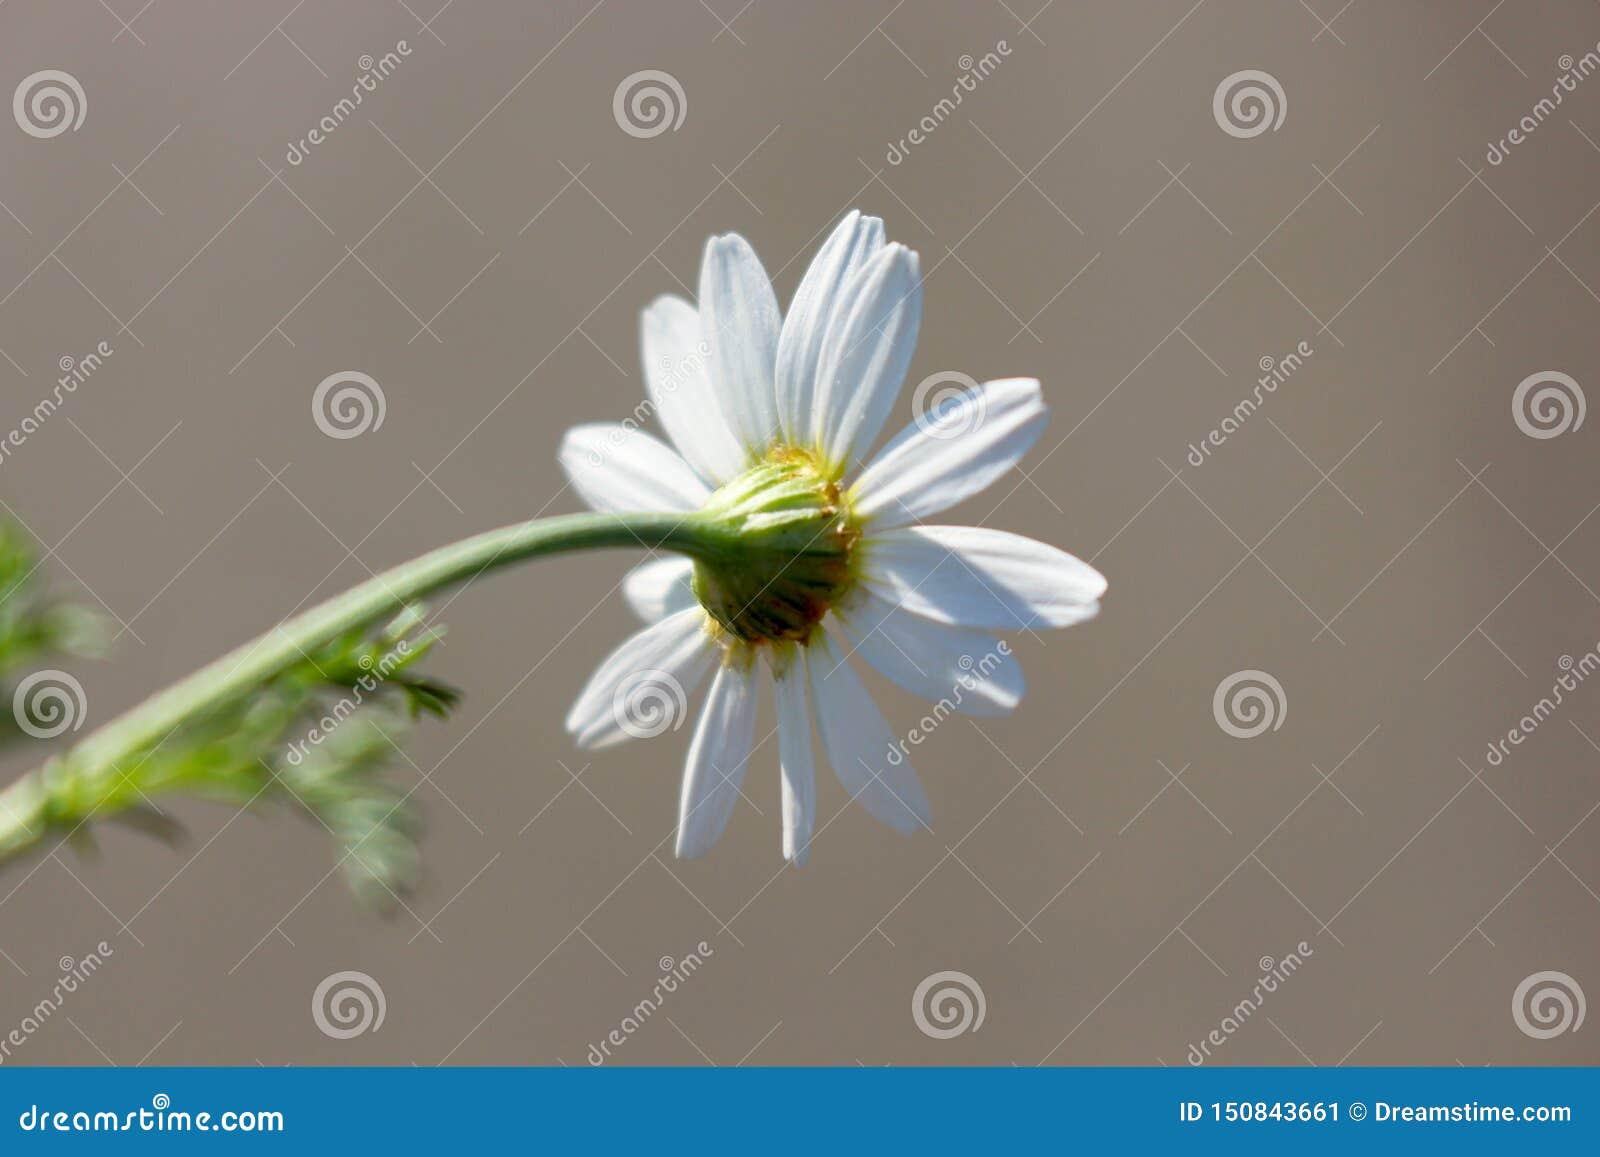 Macro photo of bright summer white chamomile on stem